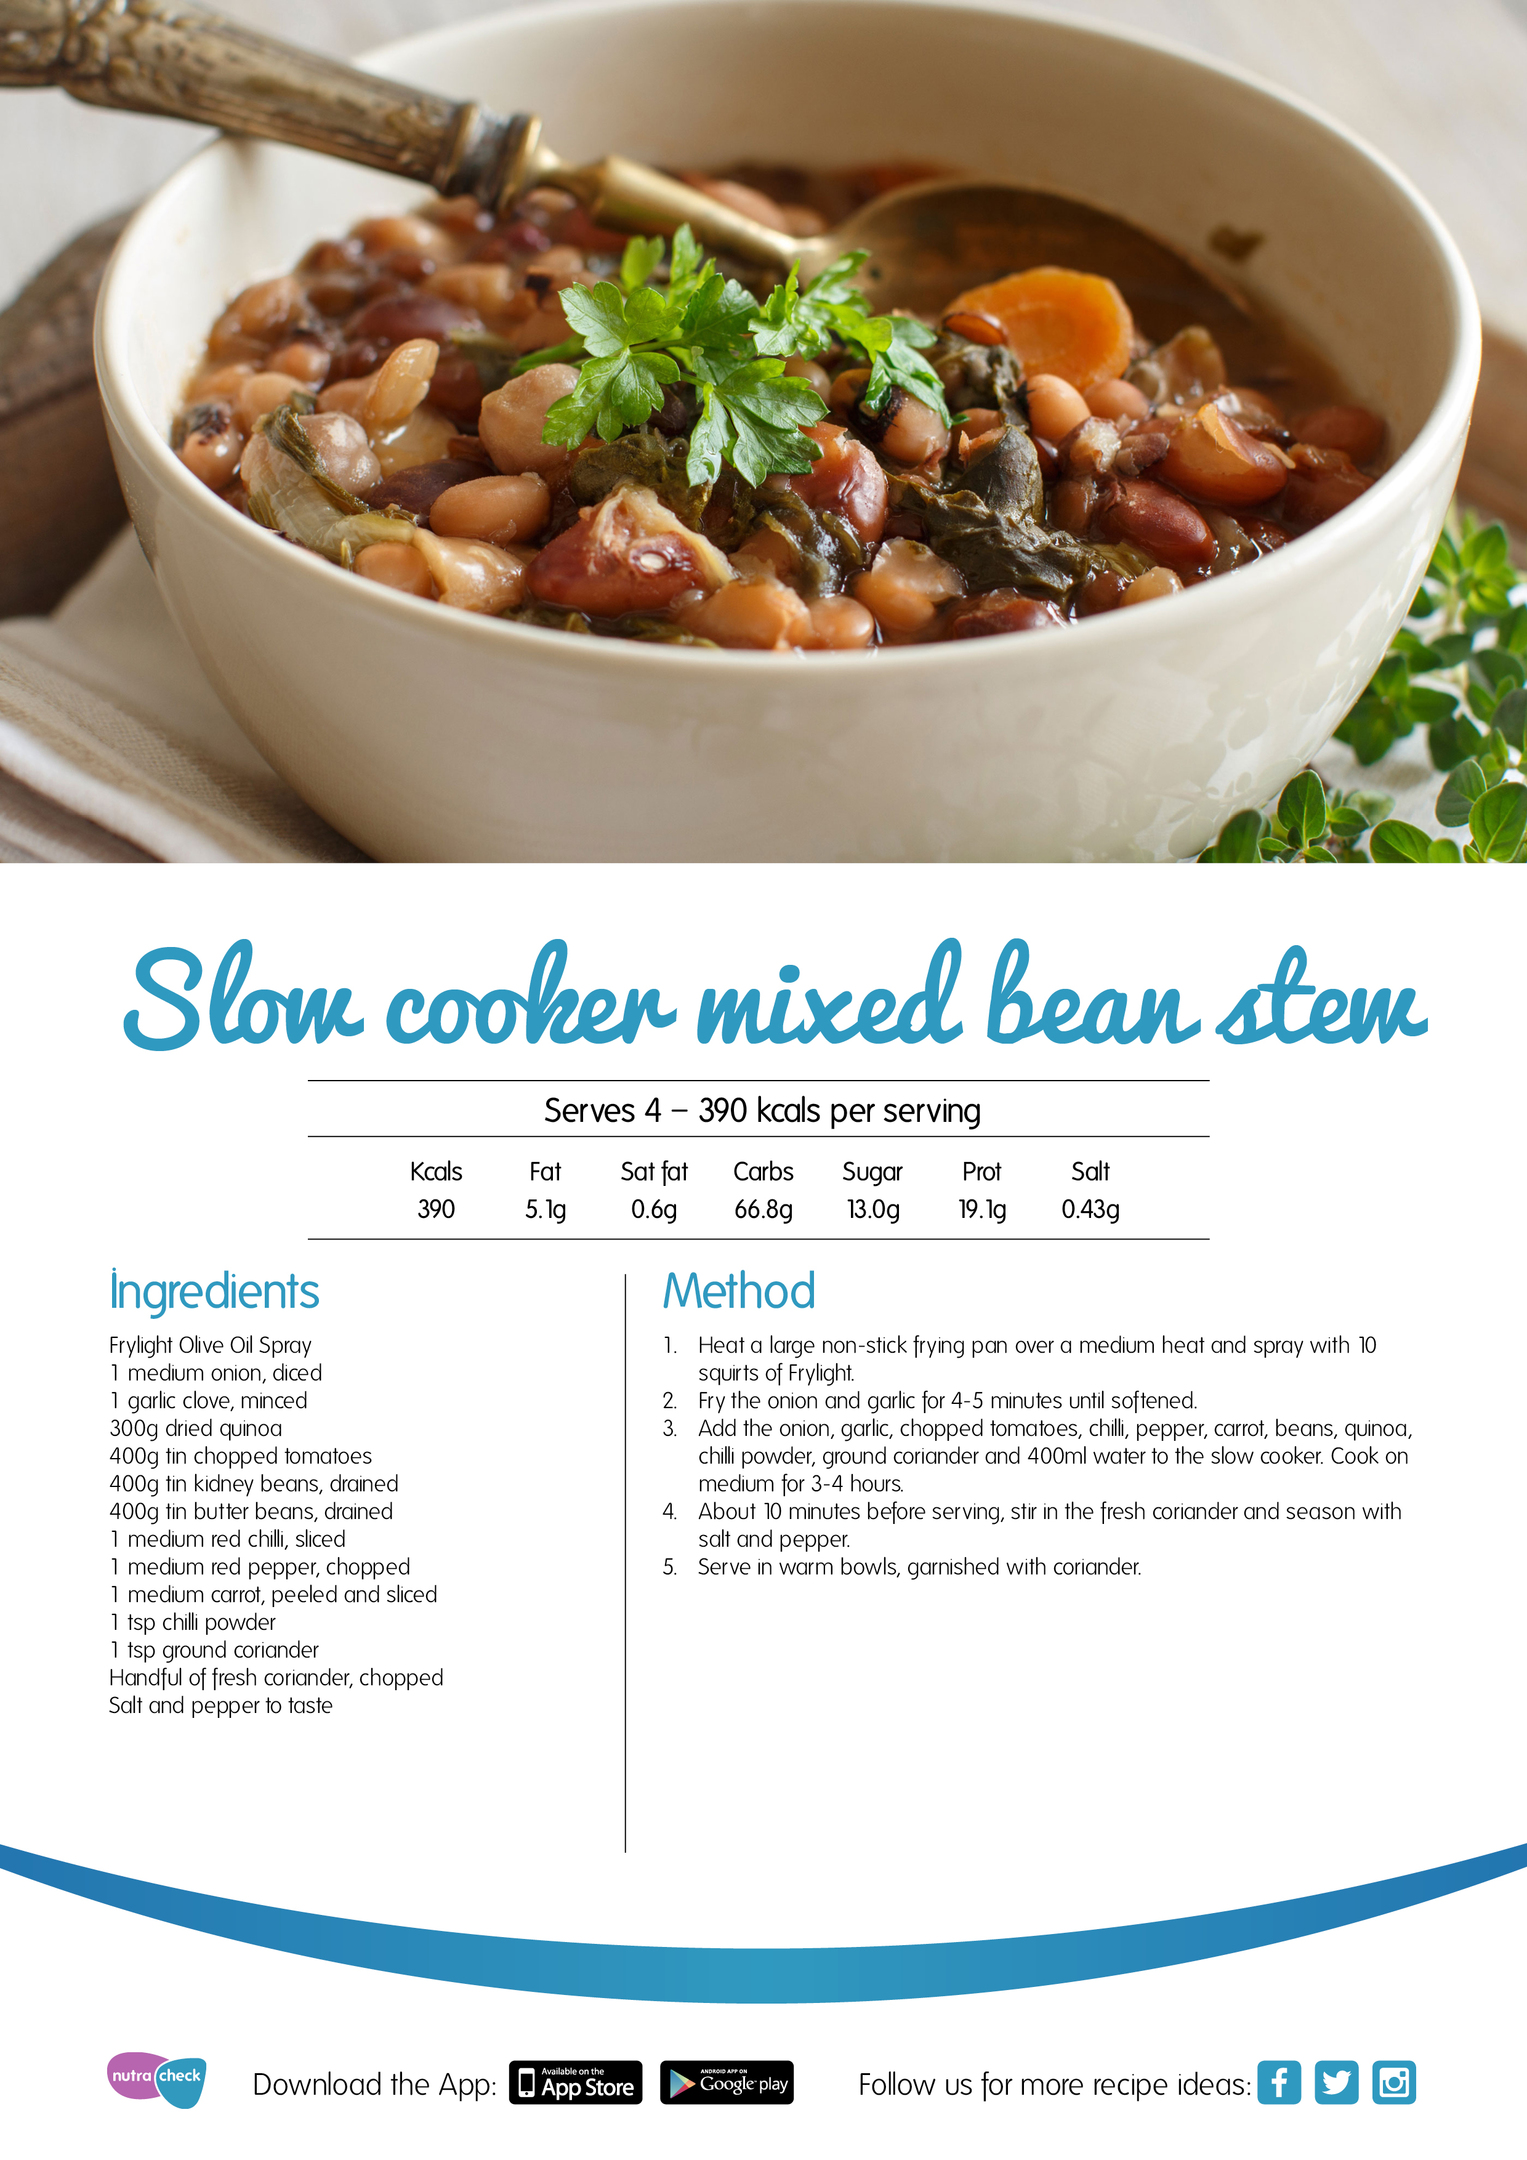 Slow cooker mixed bean stew